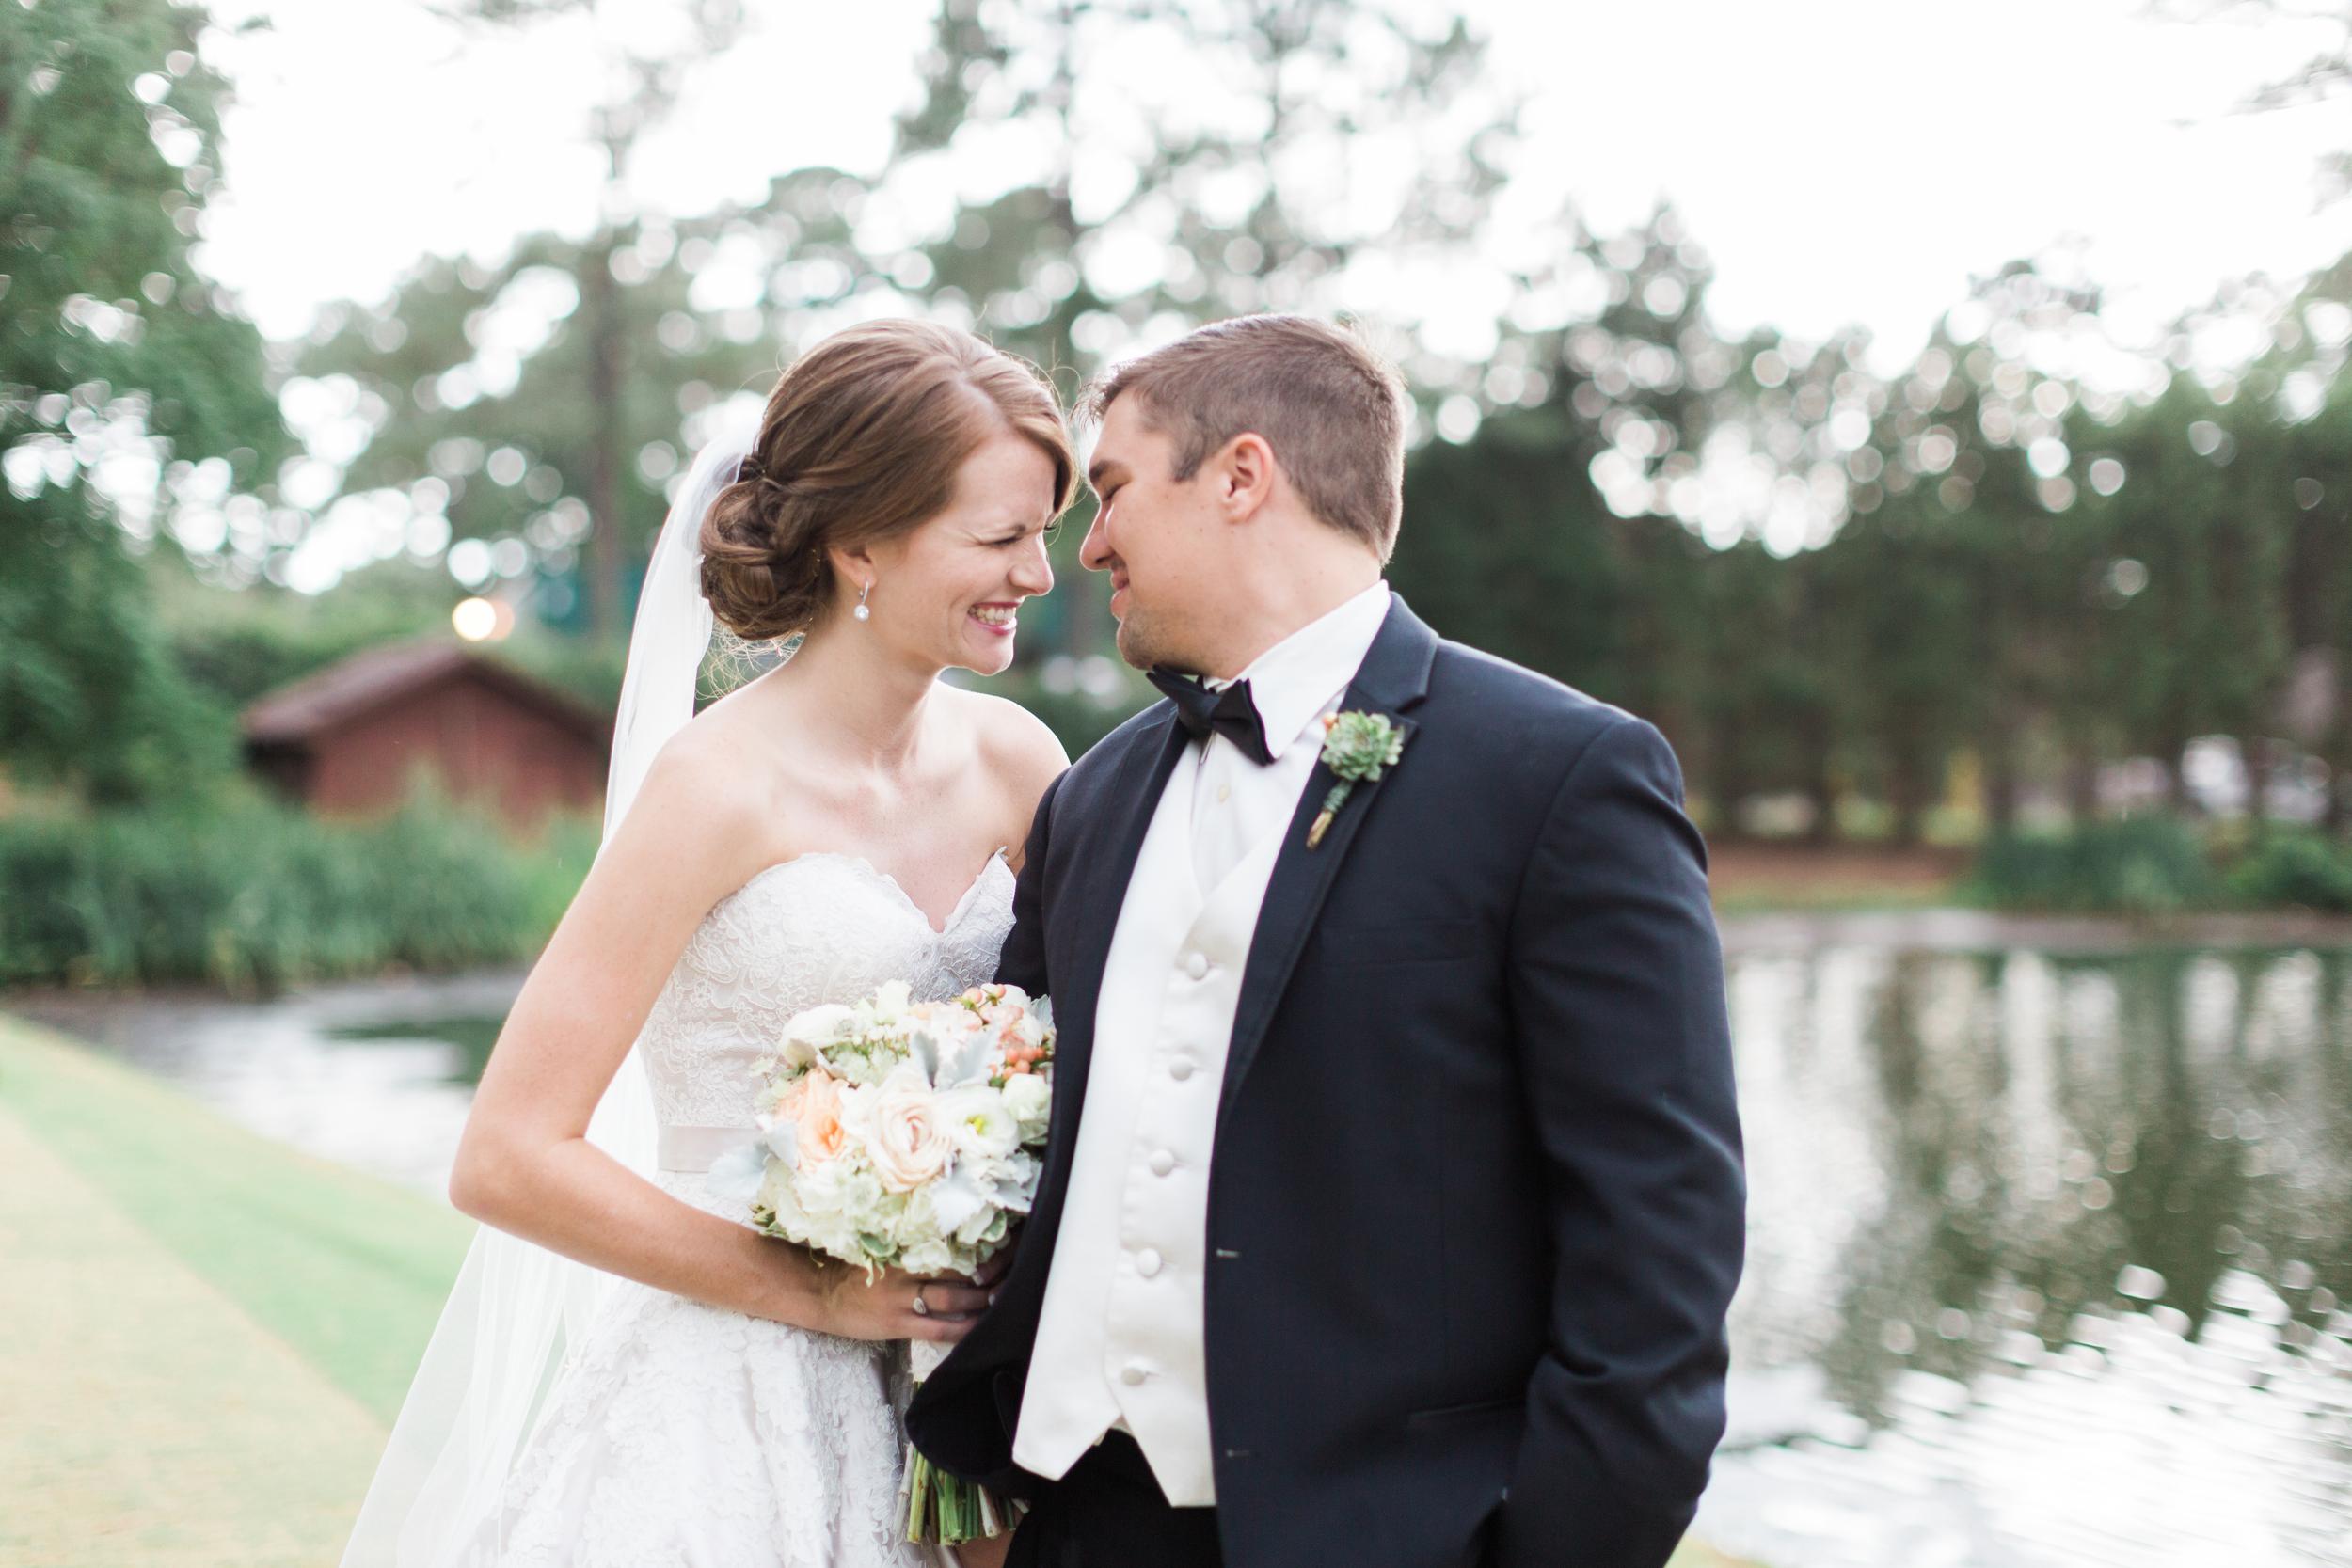 Brewbaker-Wedding-Montgomery-Alabama-Nick-Drollette-123.jpg